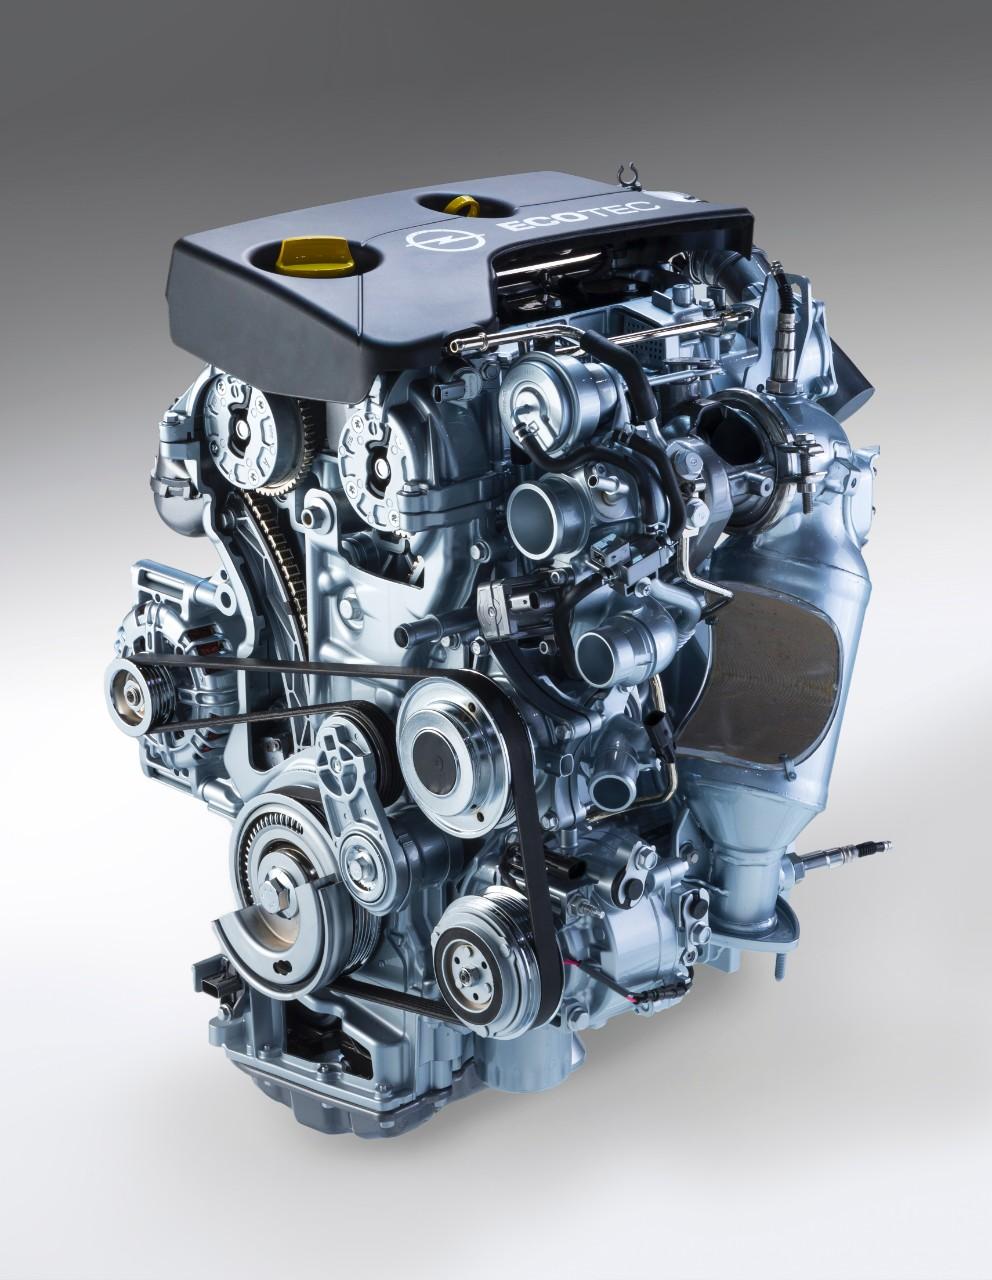 New Ecotec 1.0l Turbo engine